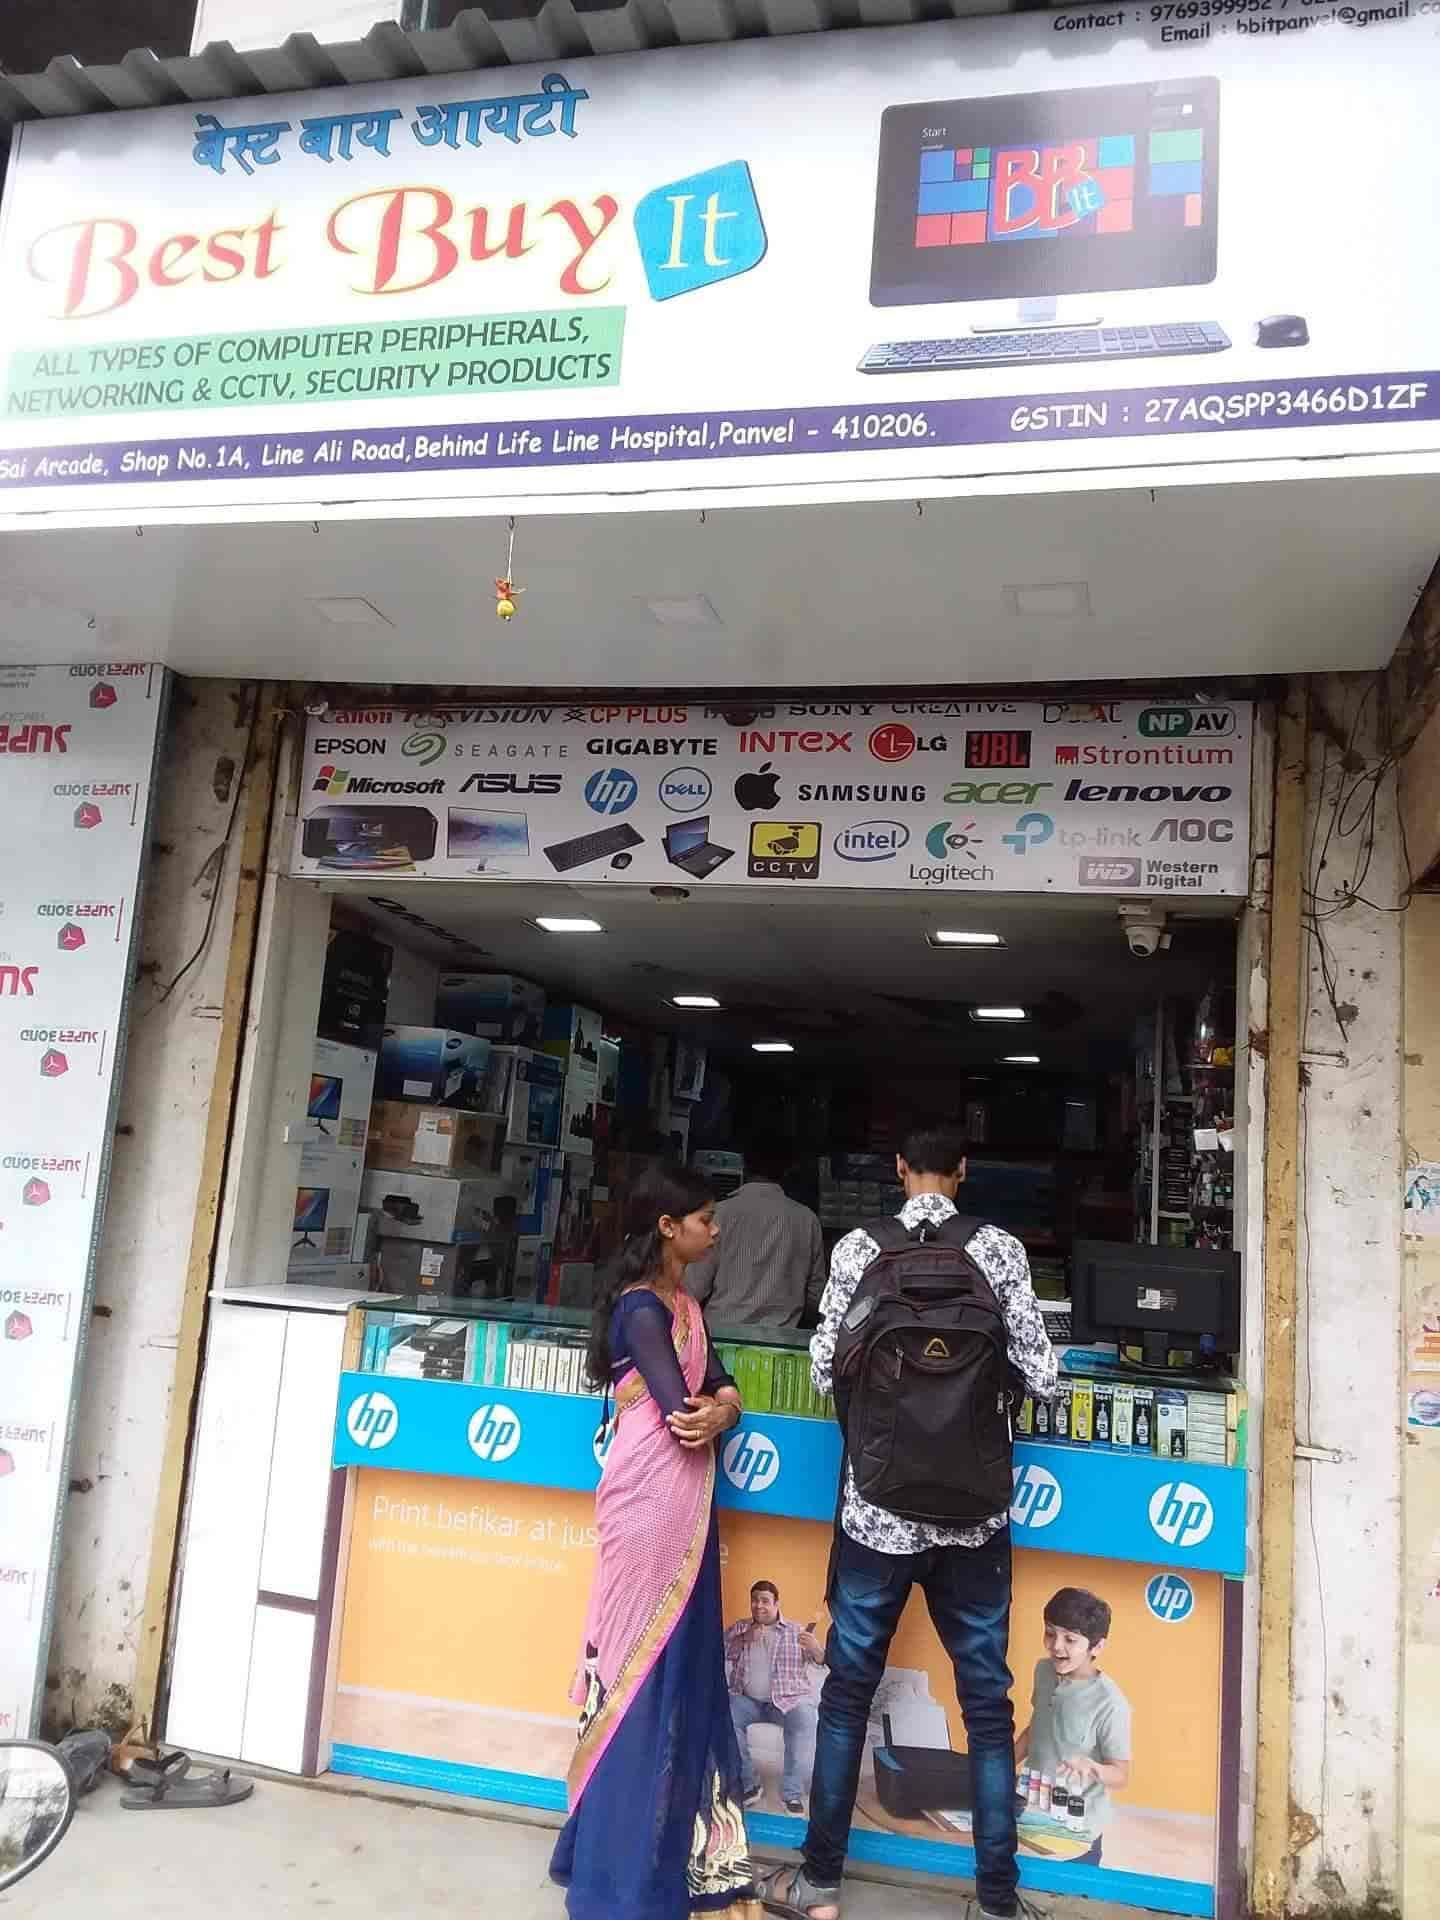 BEST Buy It Photos, Panvel, Navi-Mumbai- Pictures & Images